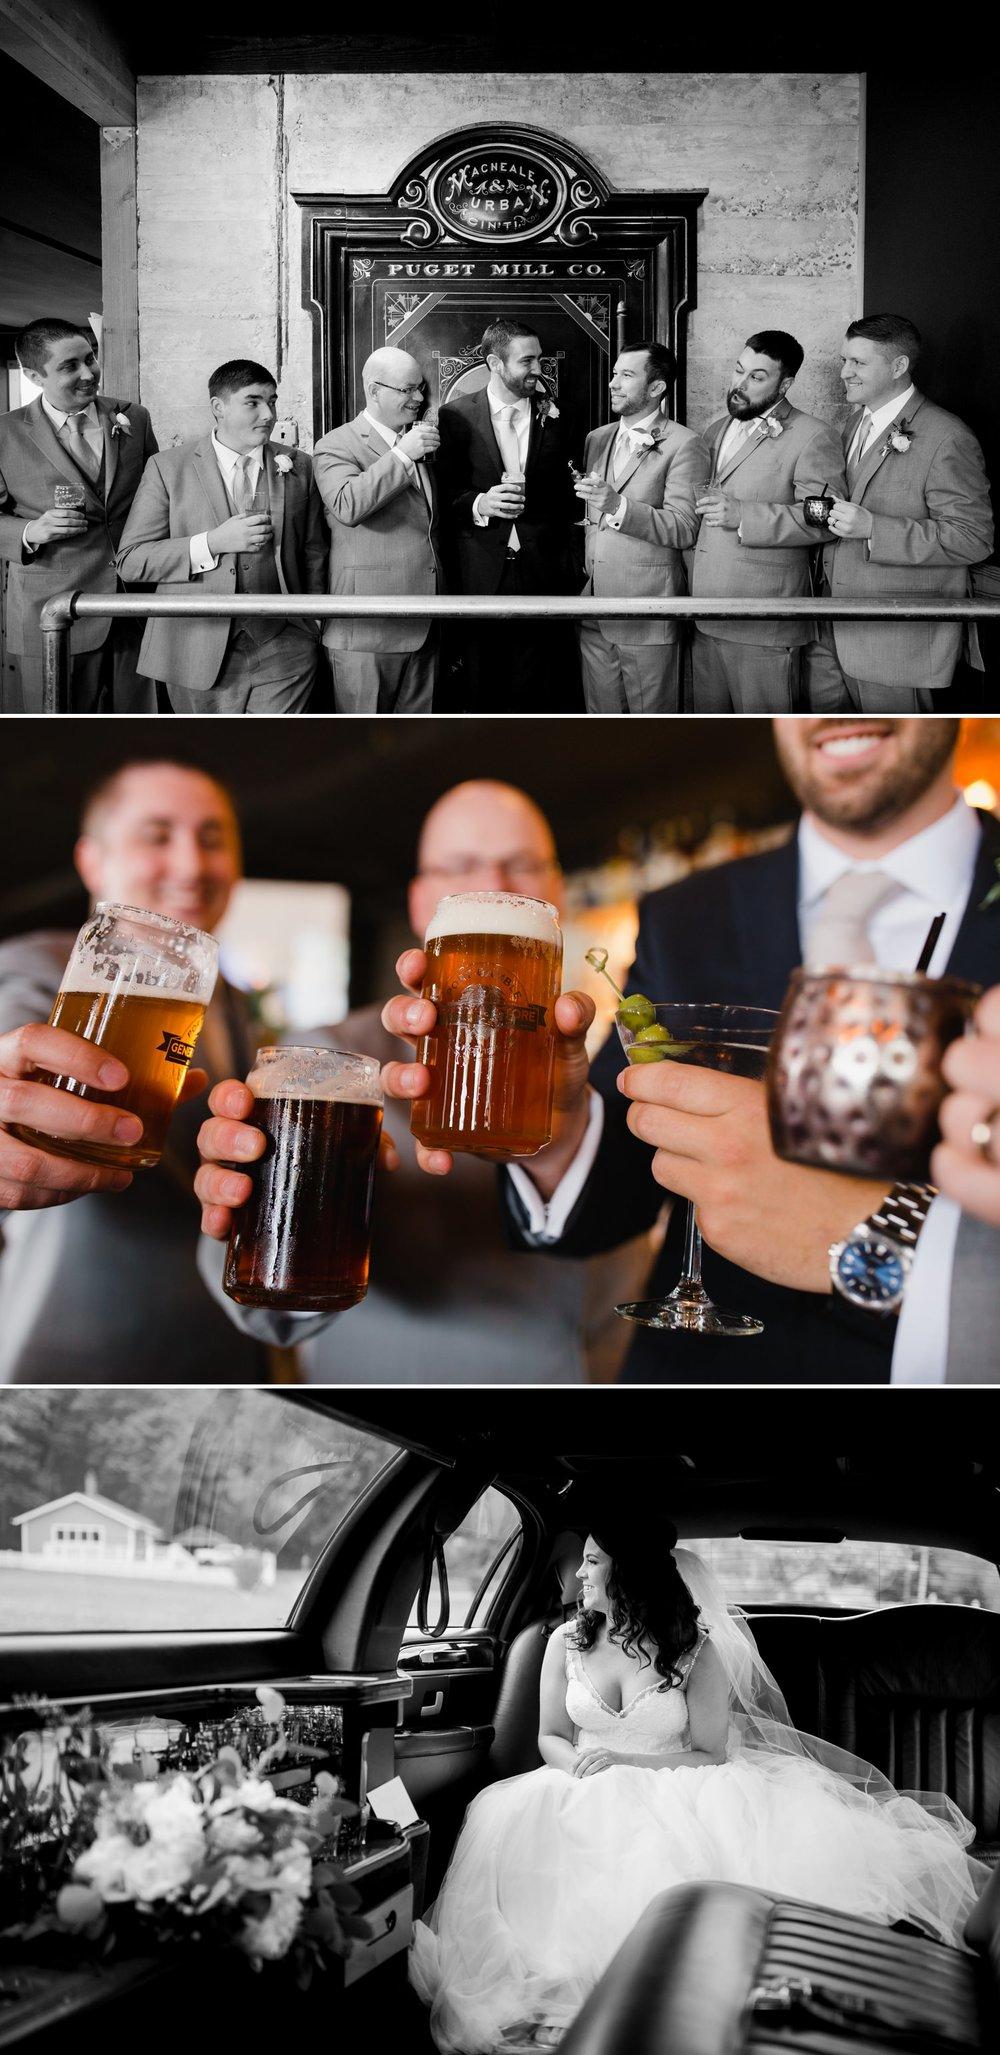 10-port-gamble-washinton-general-store-wedding.jpg